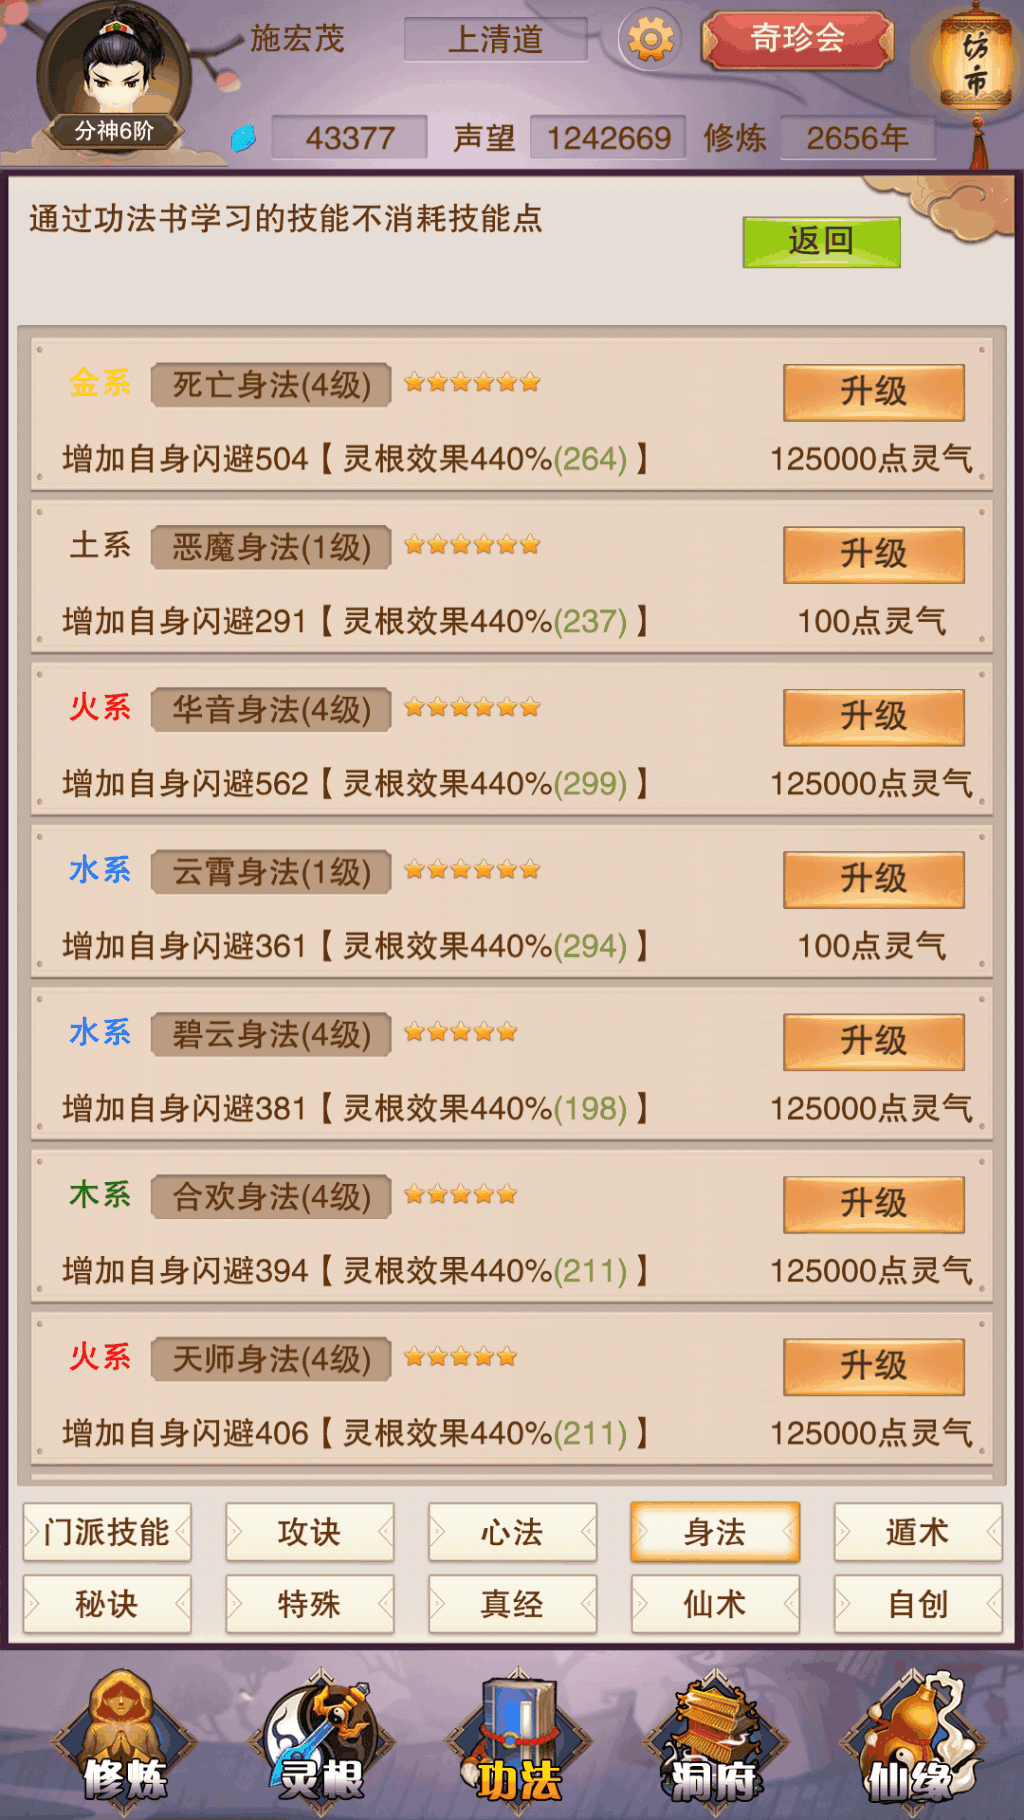 Screenshot_2018s11s10s12s17s13.png